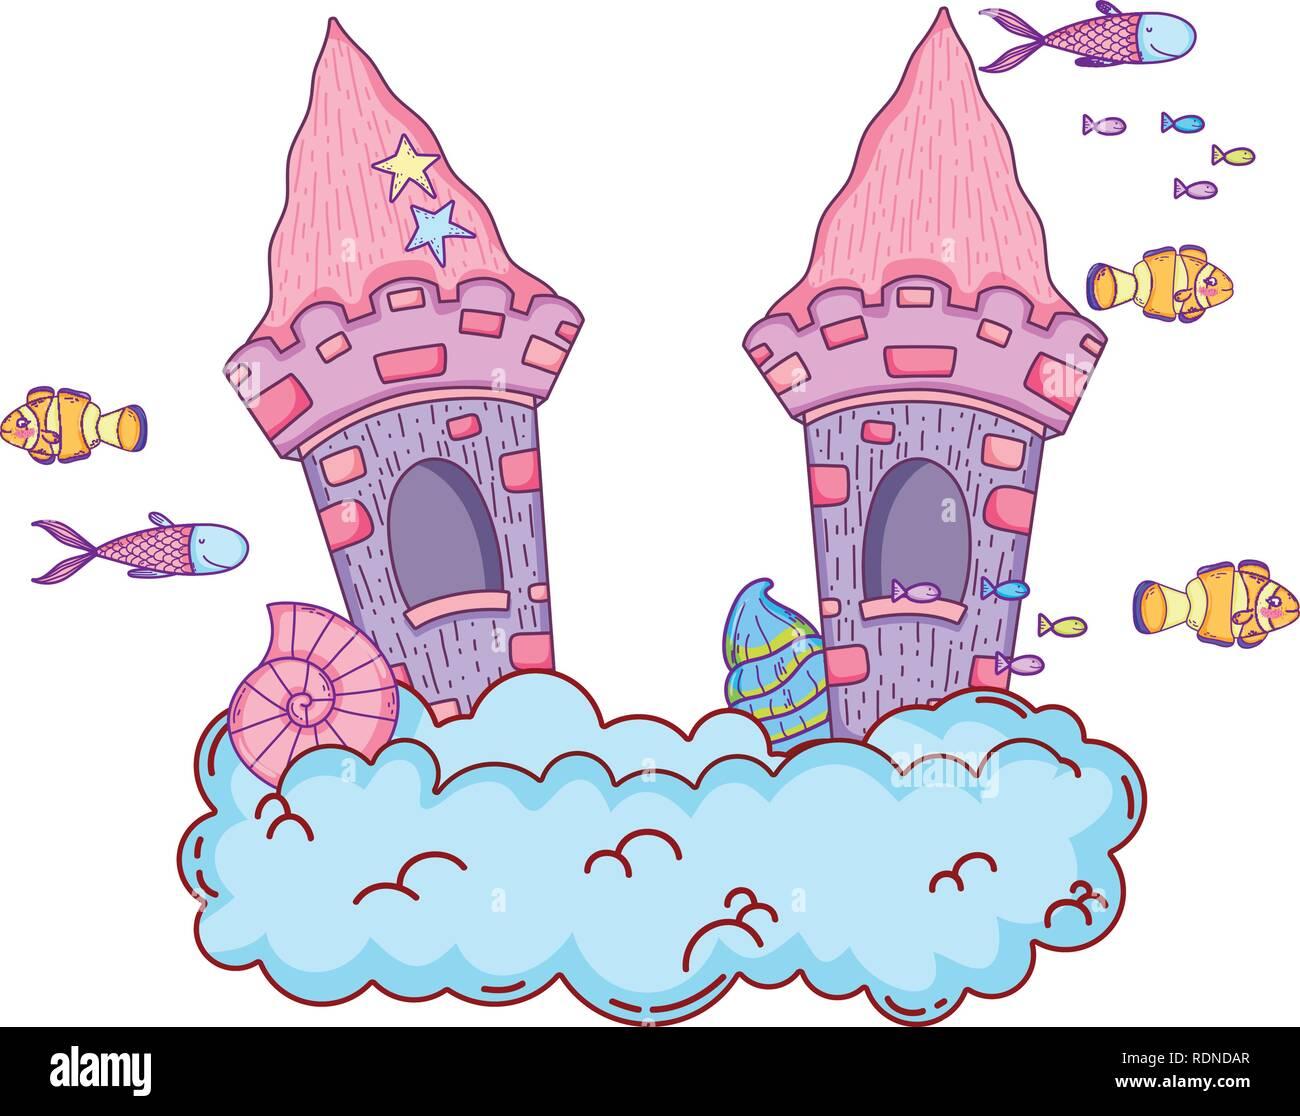 cute fairytale castle in the cloud undersea scene - Stock Image